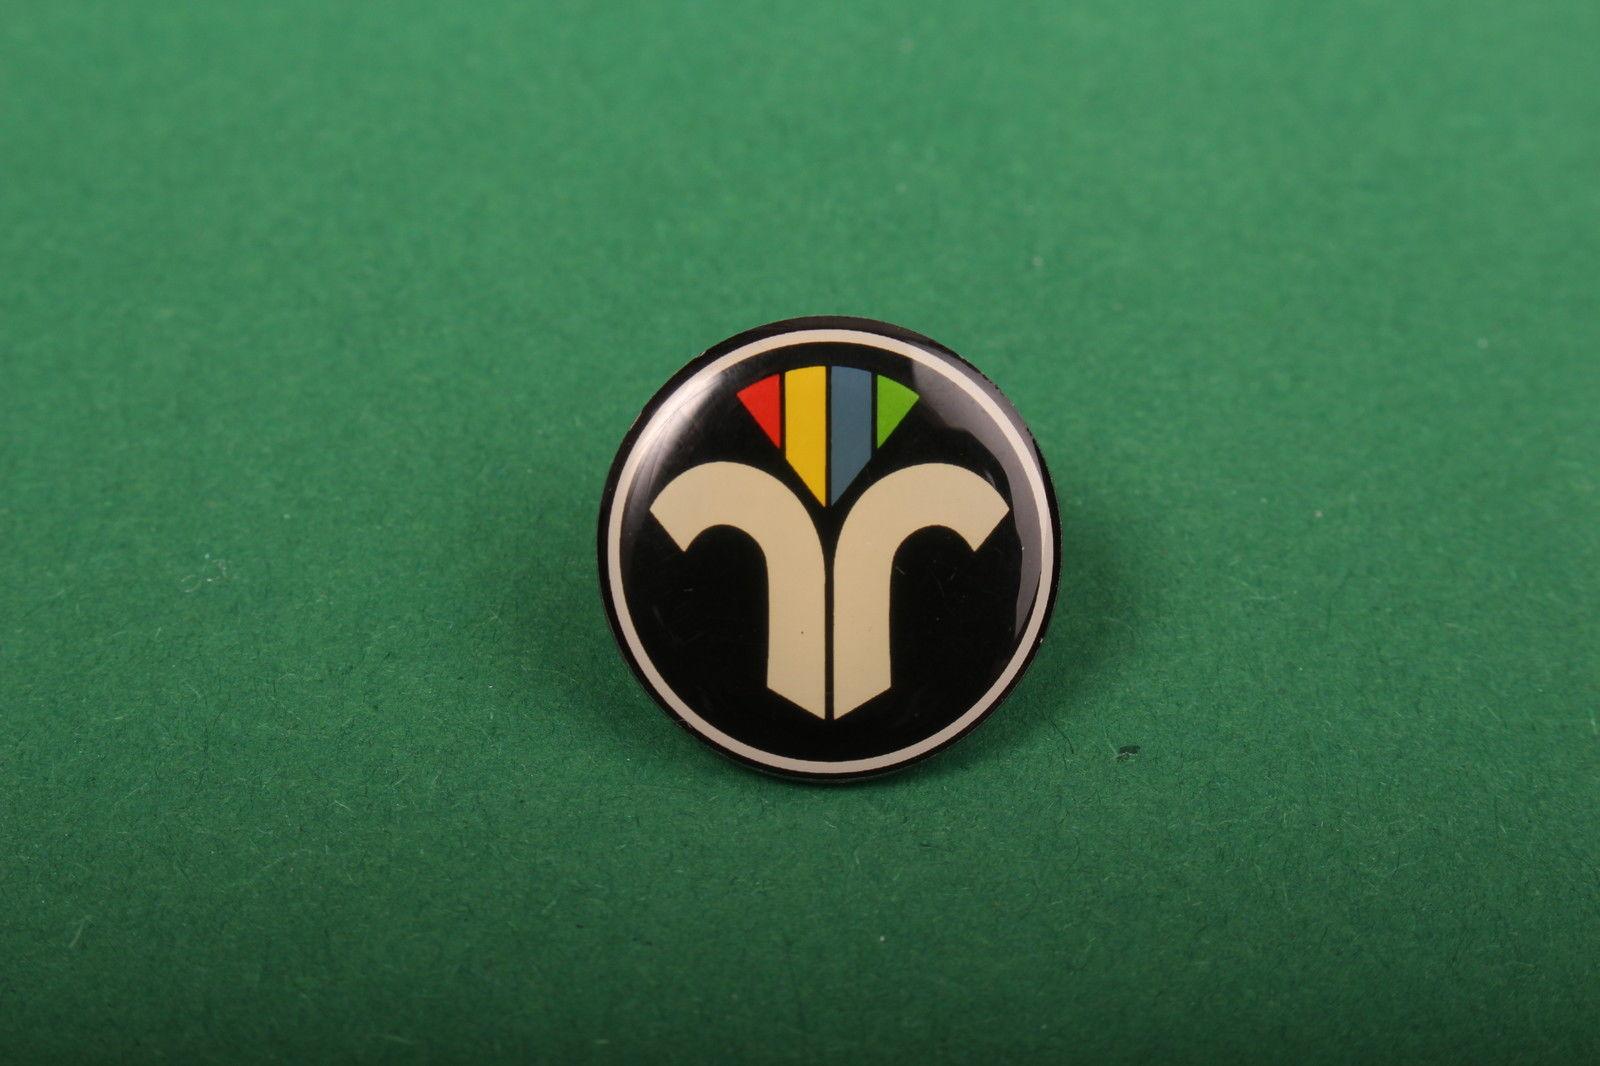 anstecker ziv emblem pin schornsteinfeger kaminkehrer kaminfeger. Black Bedroom Furniture Sets. Home Design Ideas